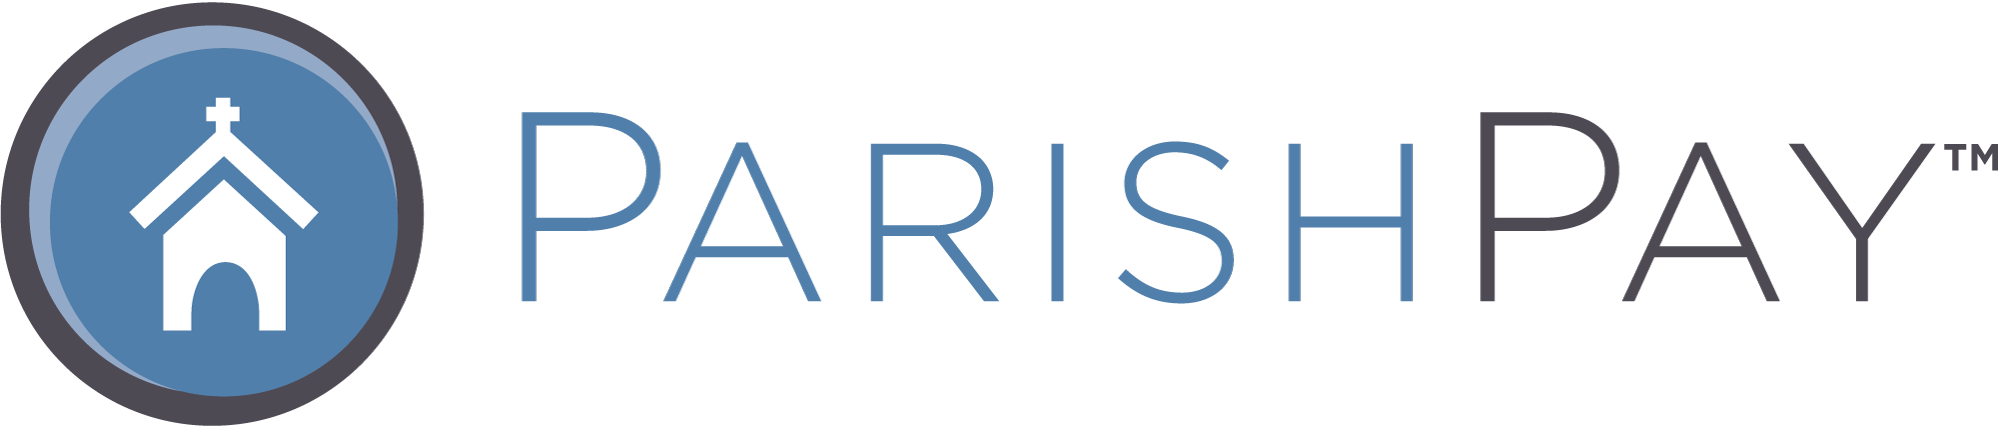 parishpay_logo_horizontal_color